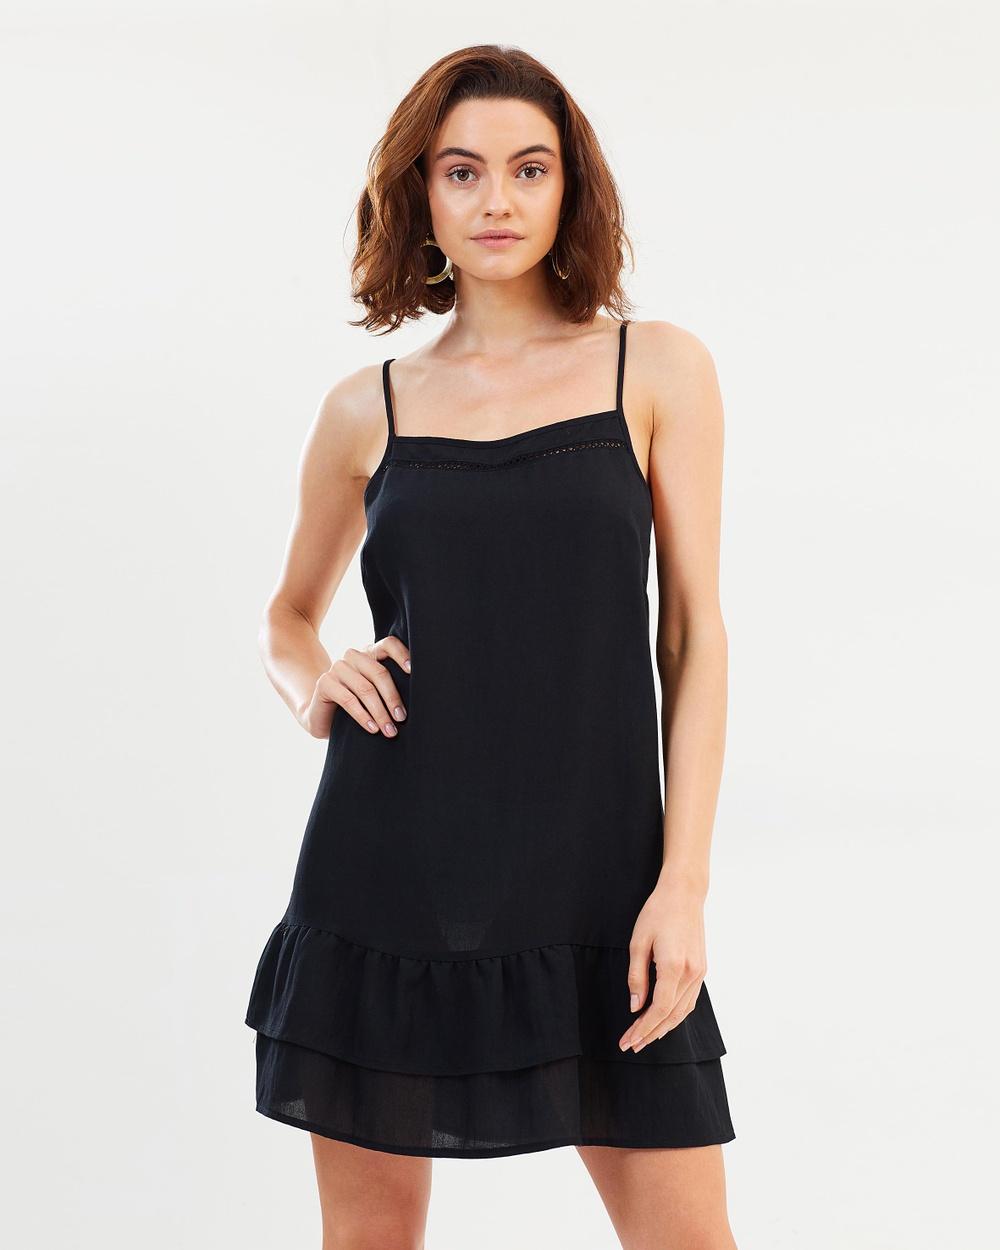 Dazie Faye Square Neckline Dress Dresses Black Faye Square Neckline Dress